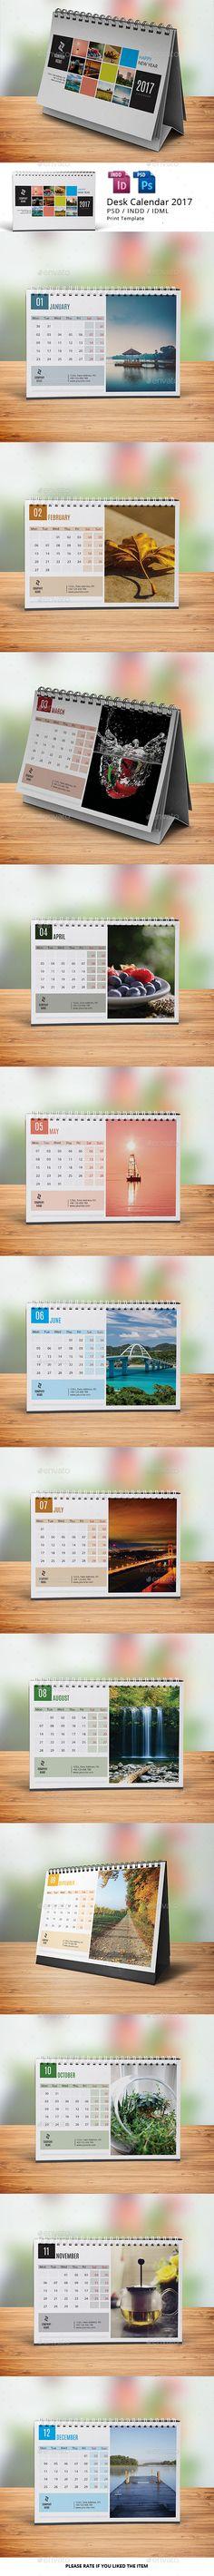 Desk Calendar 2017 Design Template - Calendars Stationery Design Template PSD, InDesign INDD. Download here: https://graphicriver.net/item/desk-calendar-2017/18722710?ref=yinkira